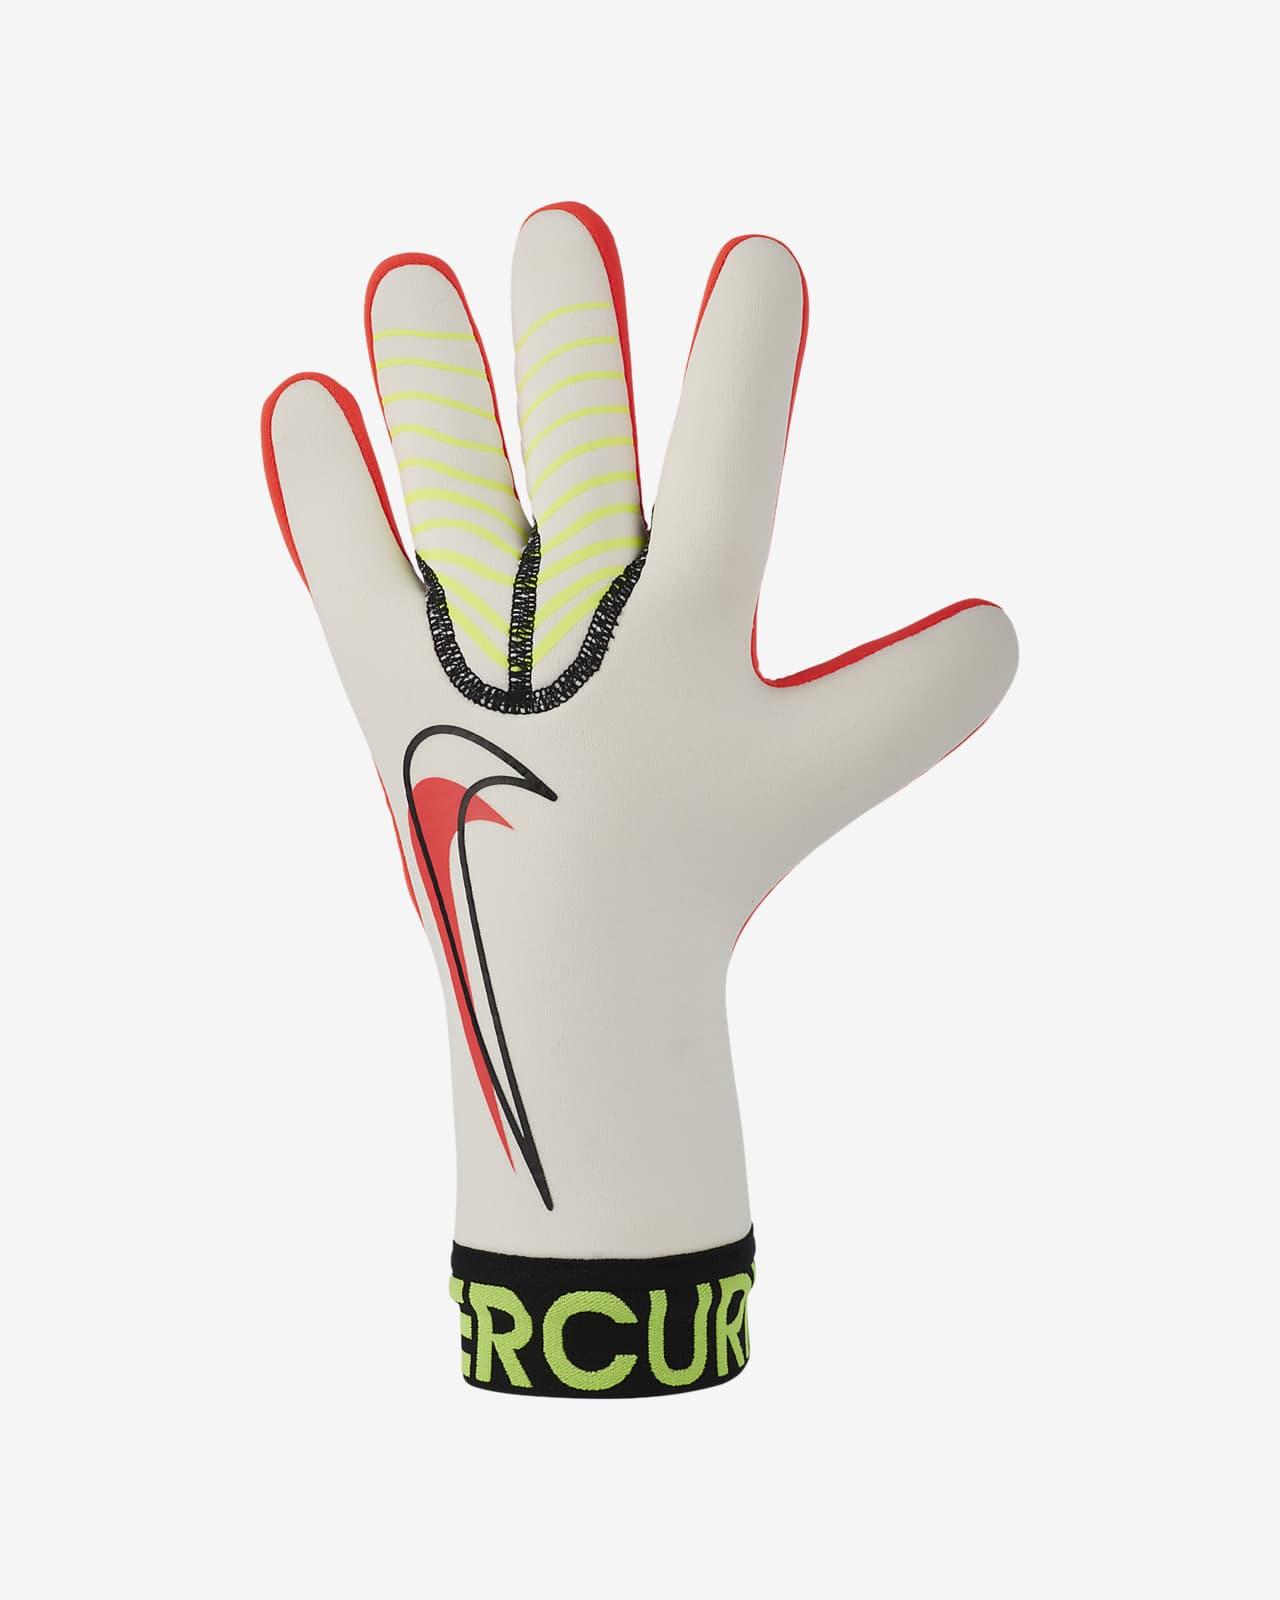 Gants de football Nike Mercurial Gardien de but Touch Victory